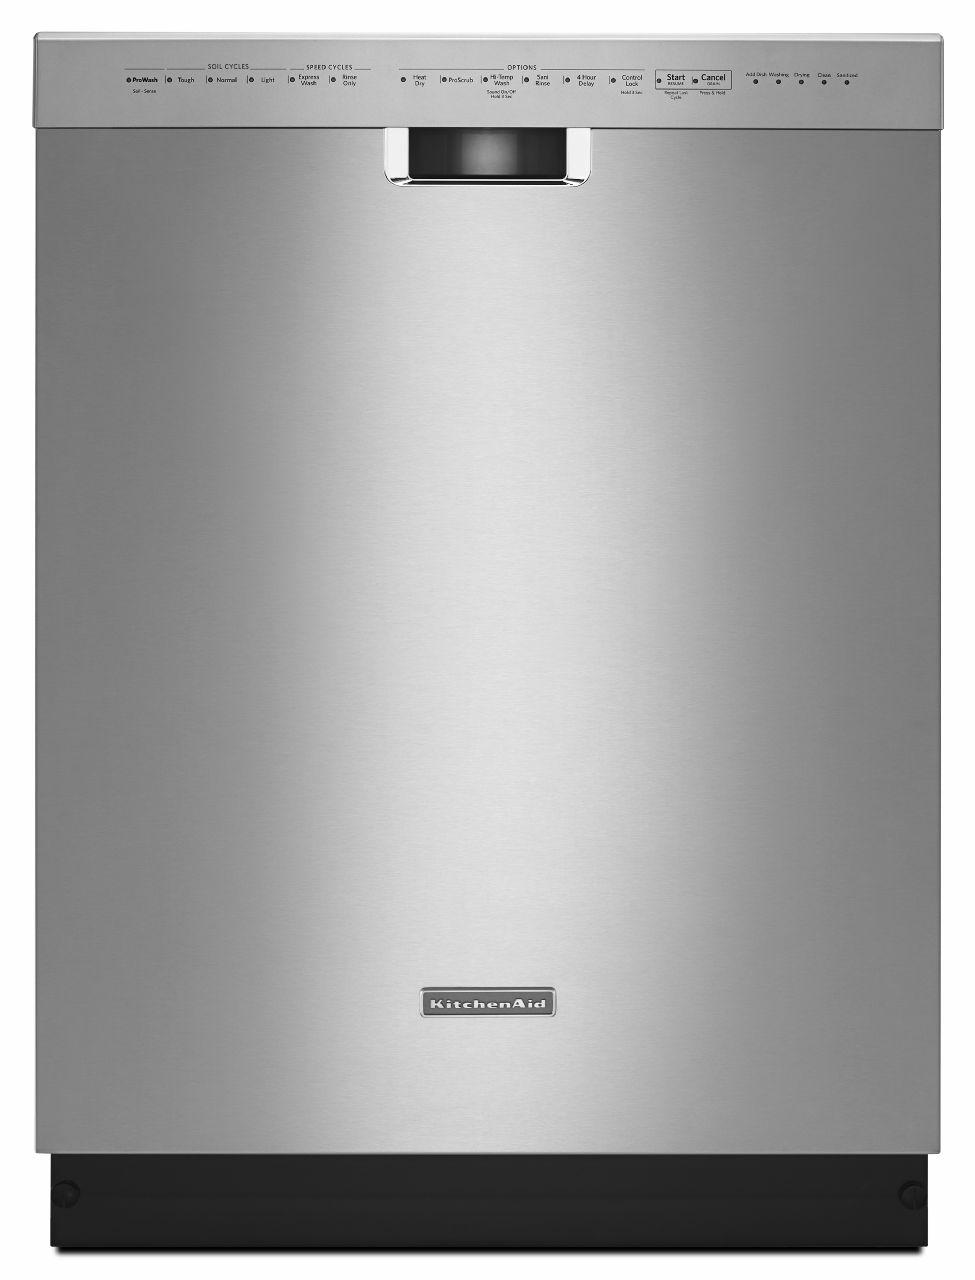 Kitchenaid Dishwasher Model Kdfe304dss0 Parts Amp Repair